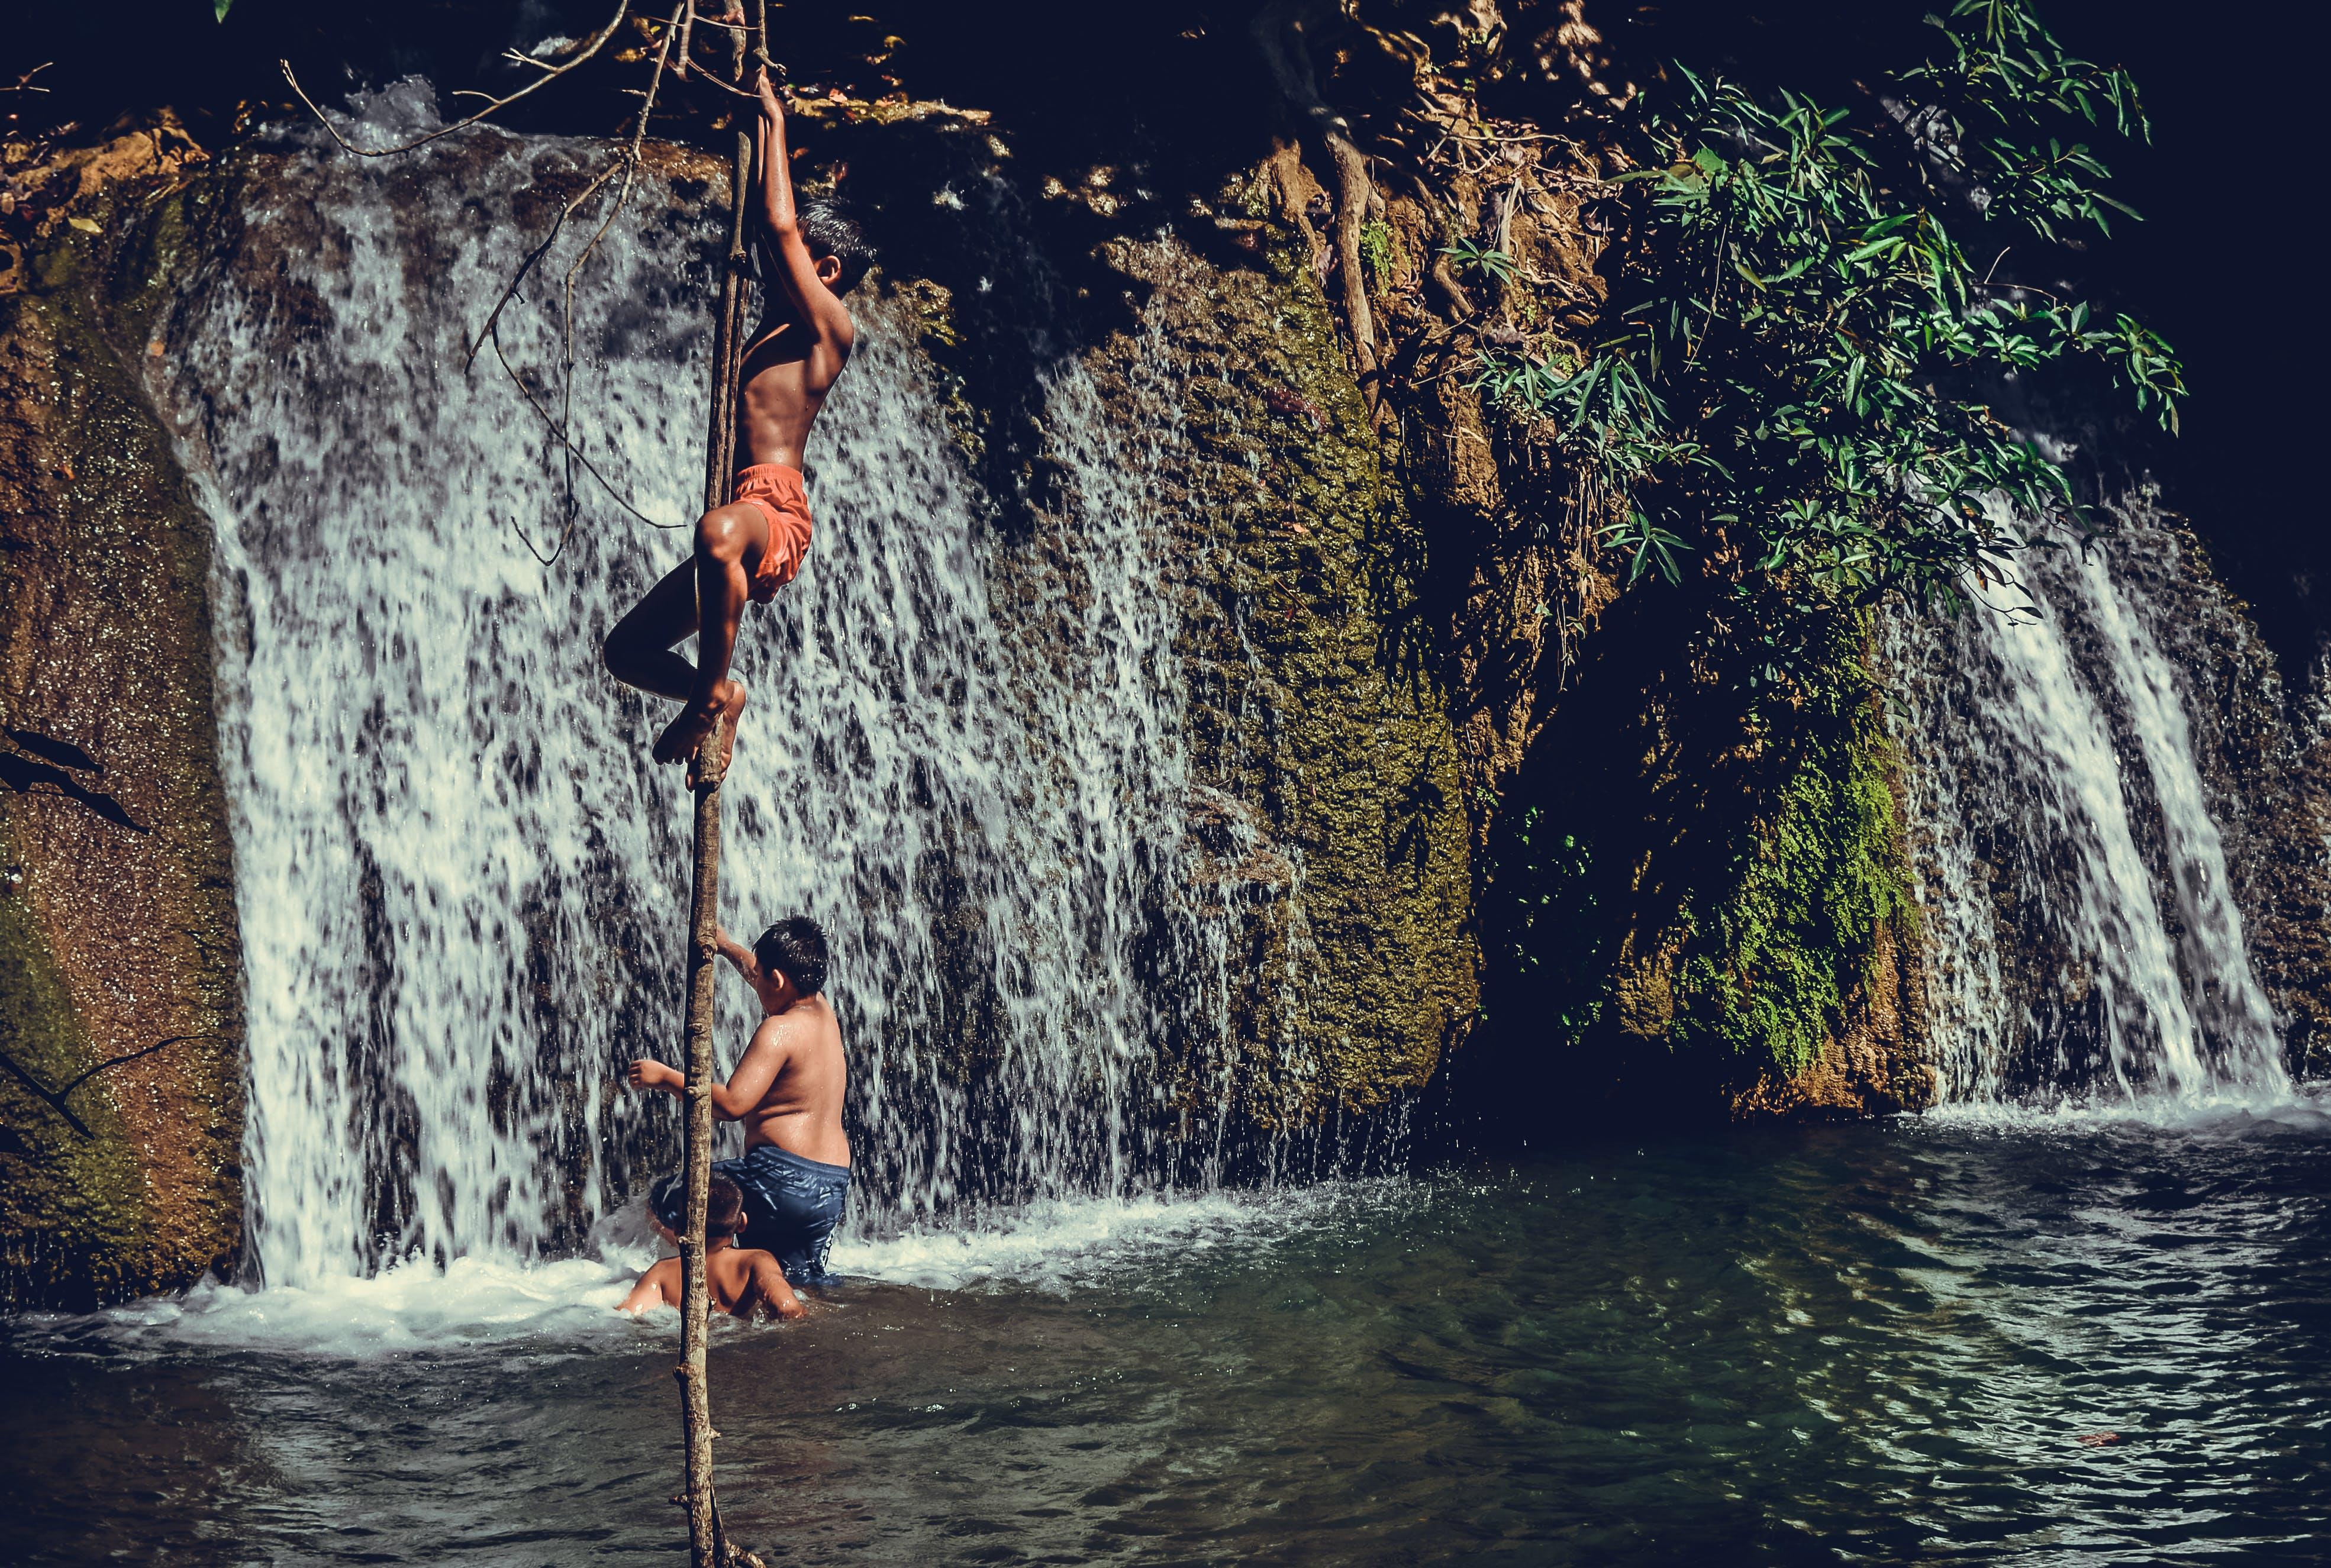 Children Climbing On Tree Branch Near Waterfalls